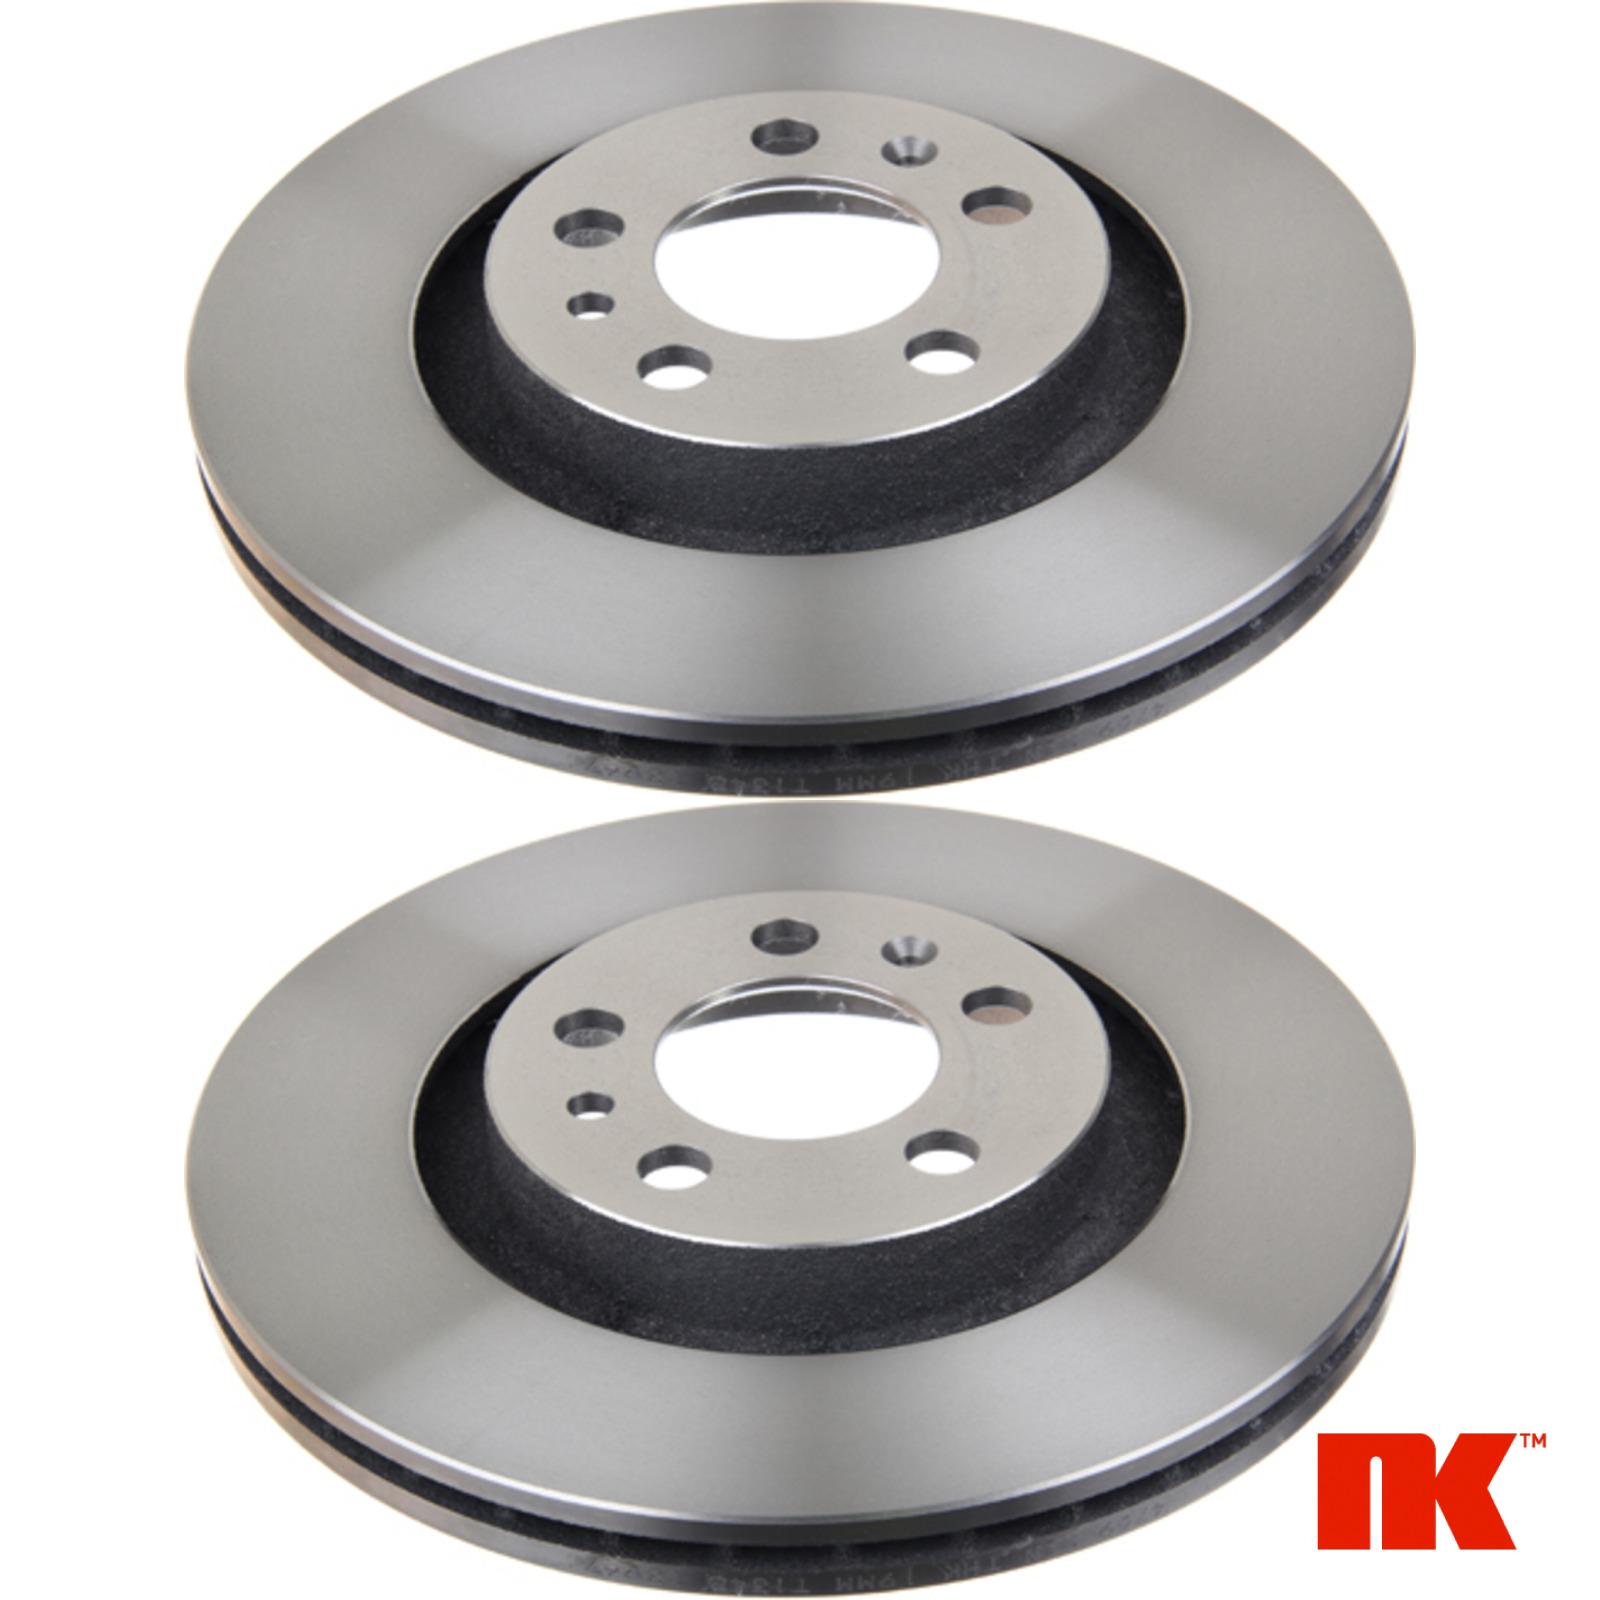 2x Bremsscheiben NK 204759